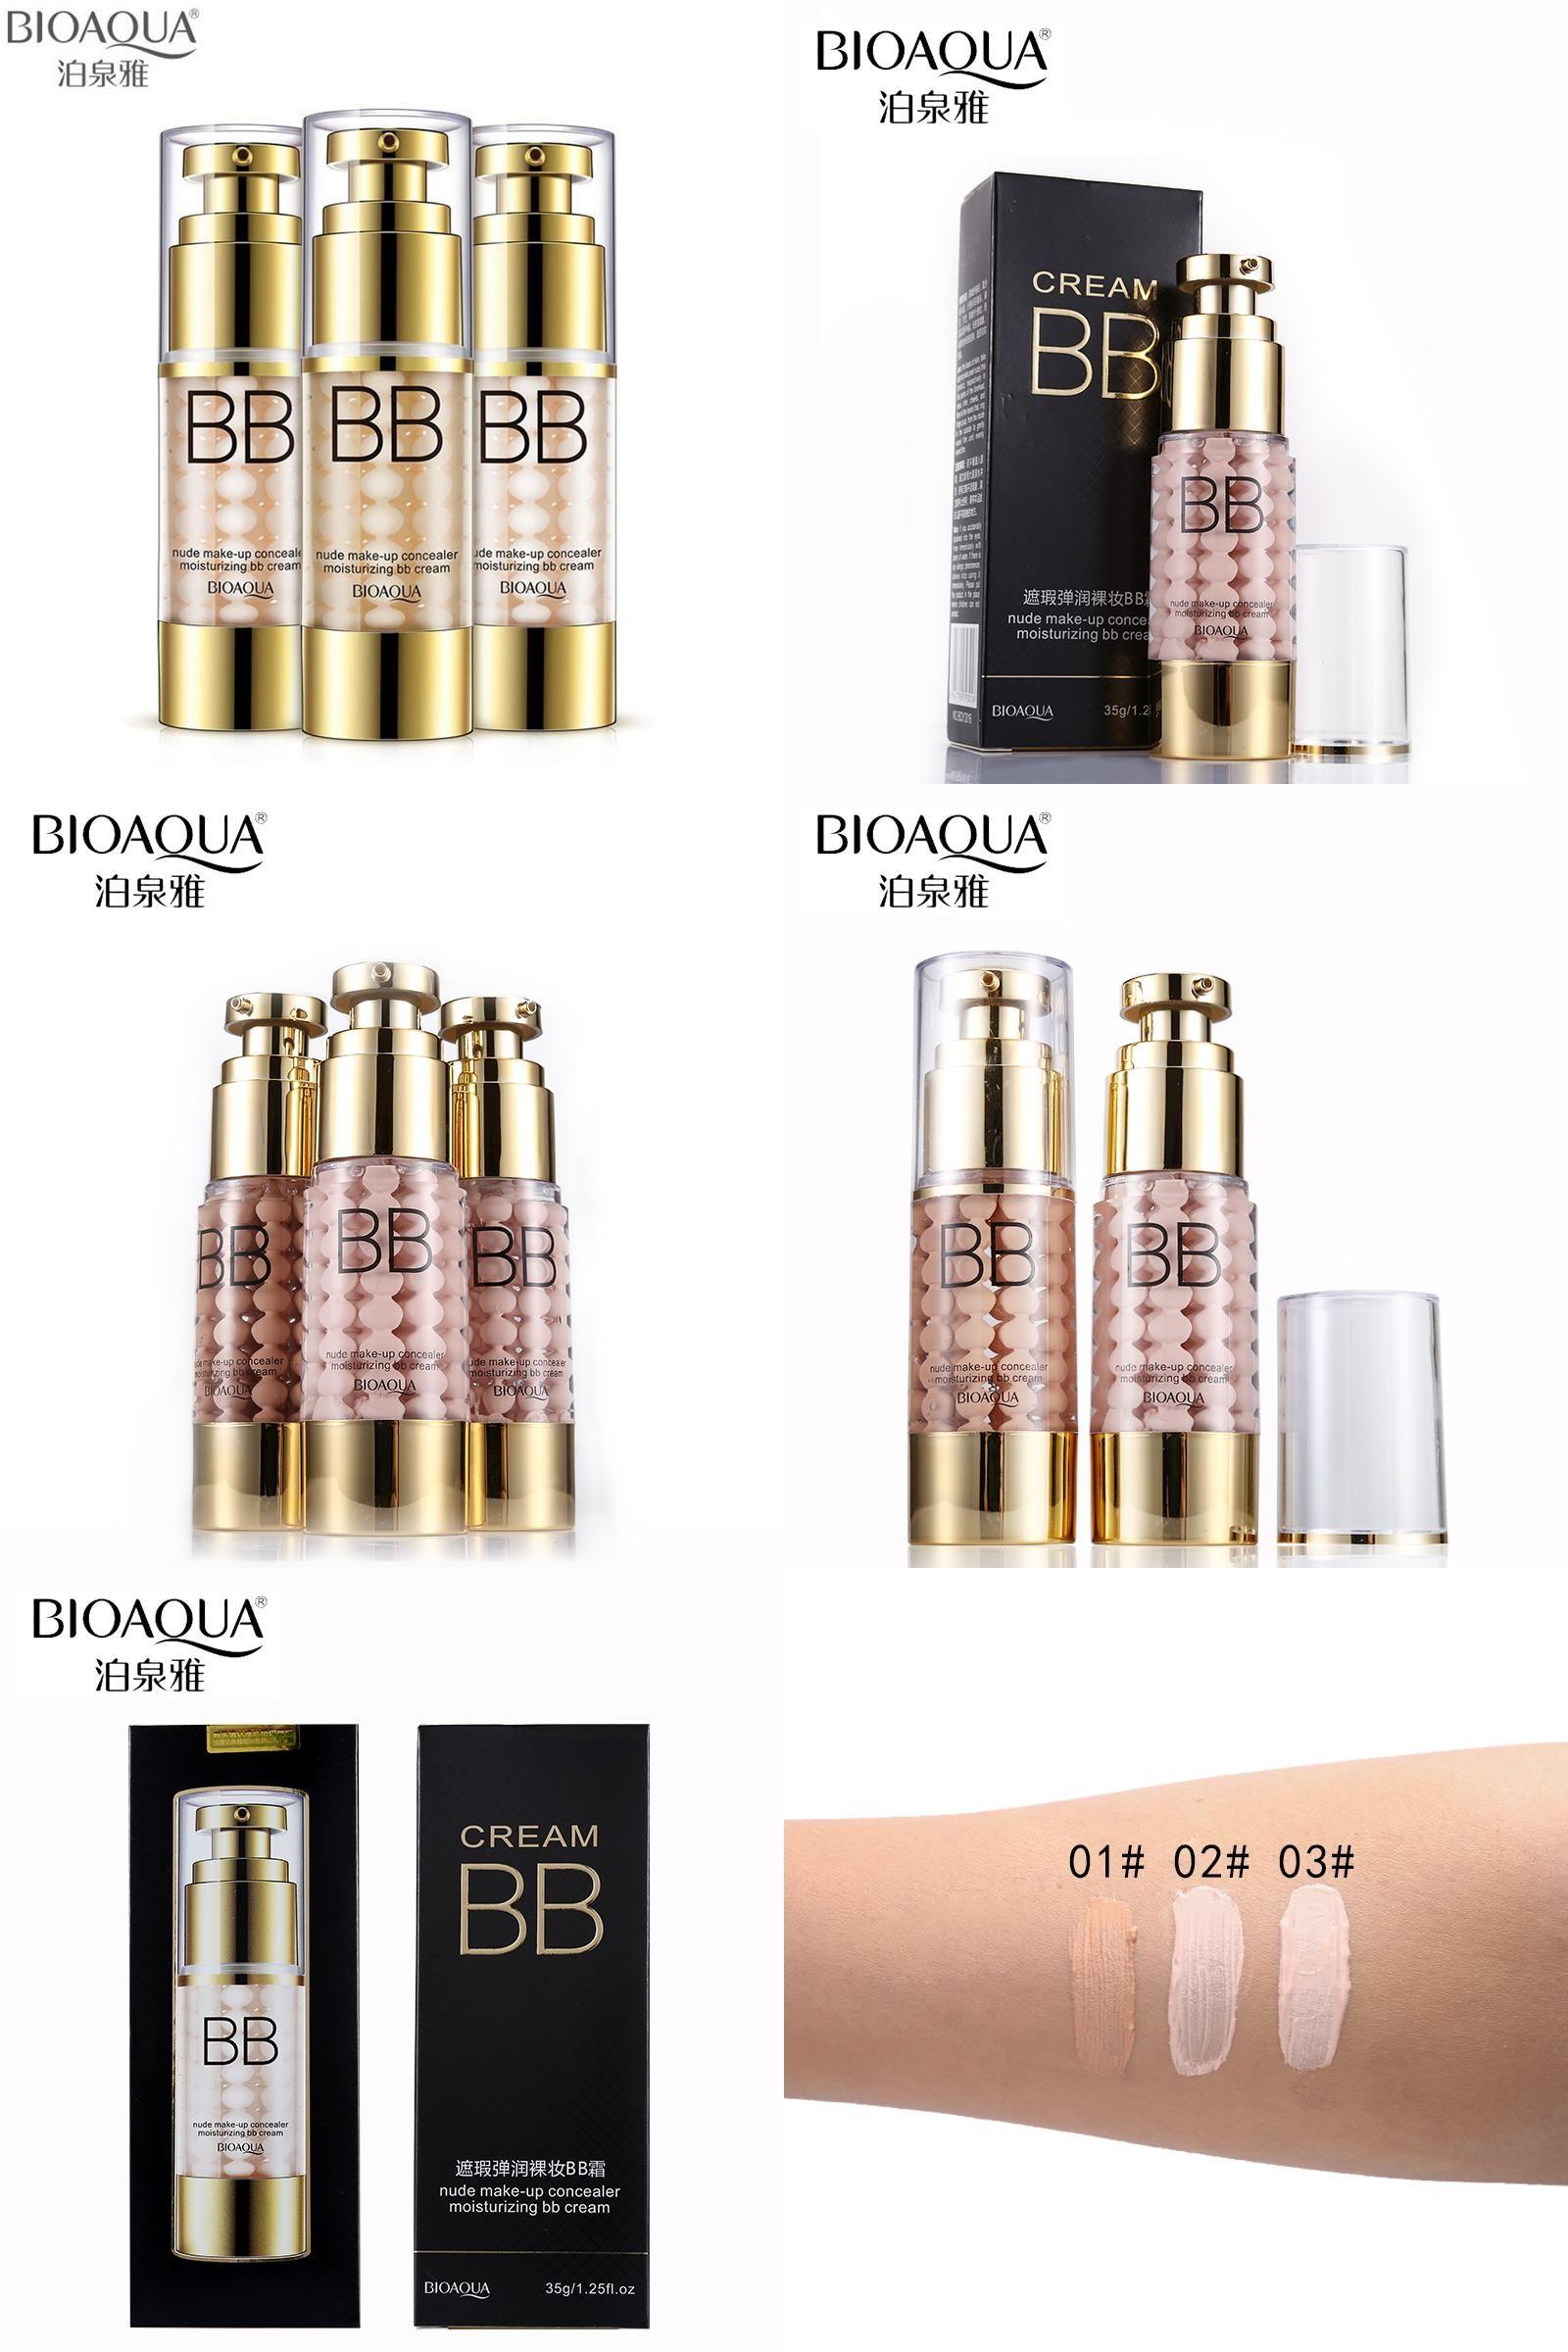 Visit To Buy Bioaqua Brand Air Cushion Bb Cc Cream Liquid Concealer Bio Aqua Aircusion Face Primer